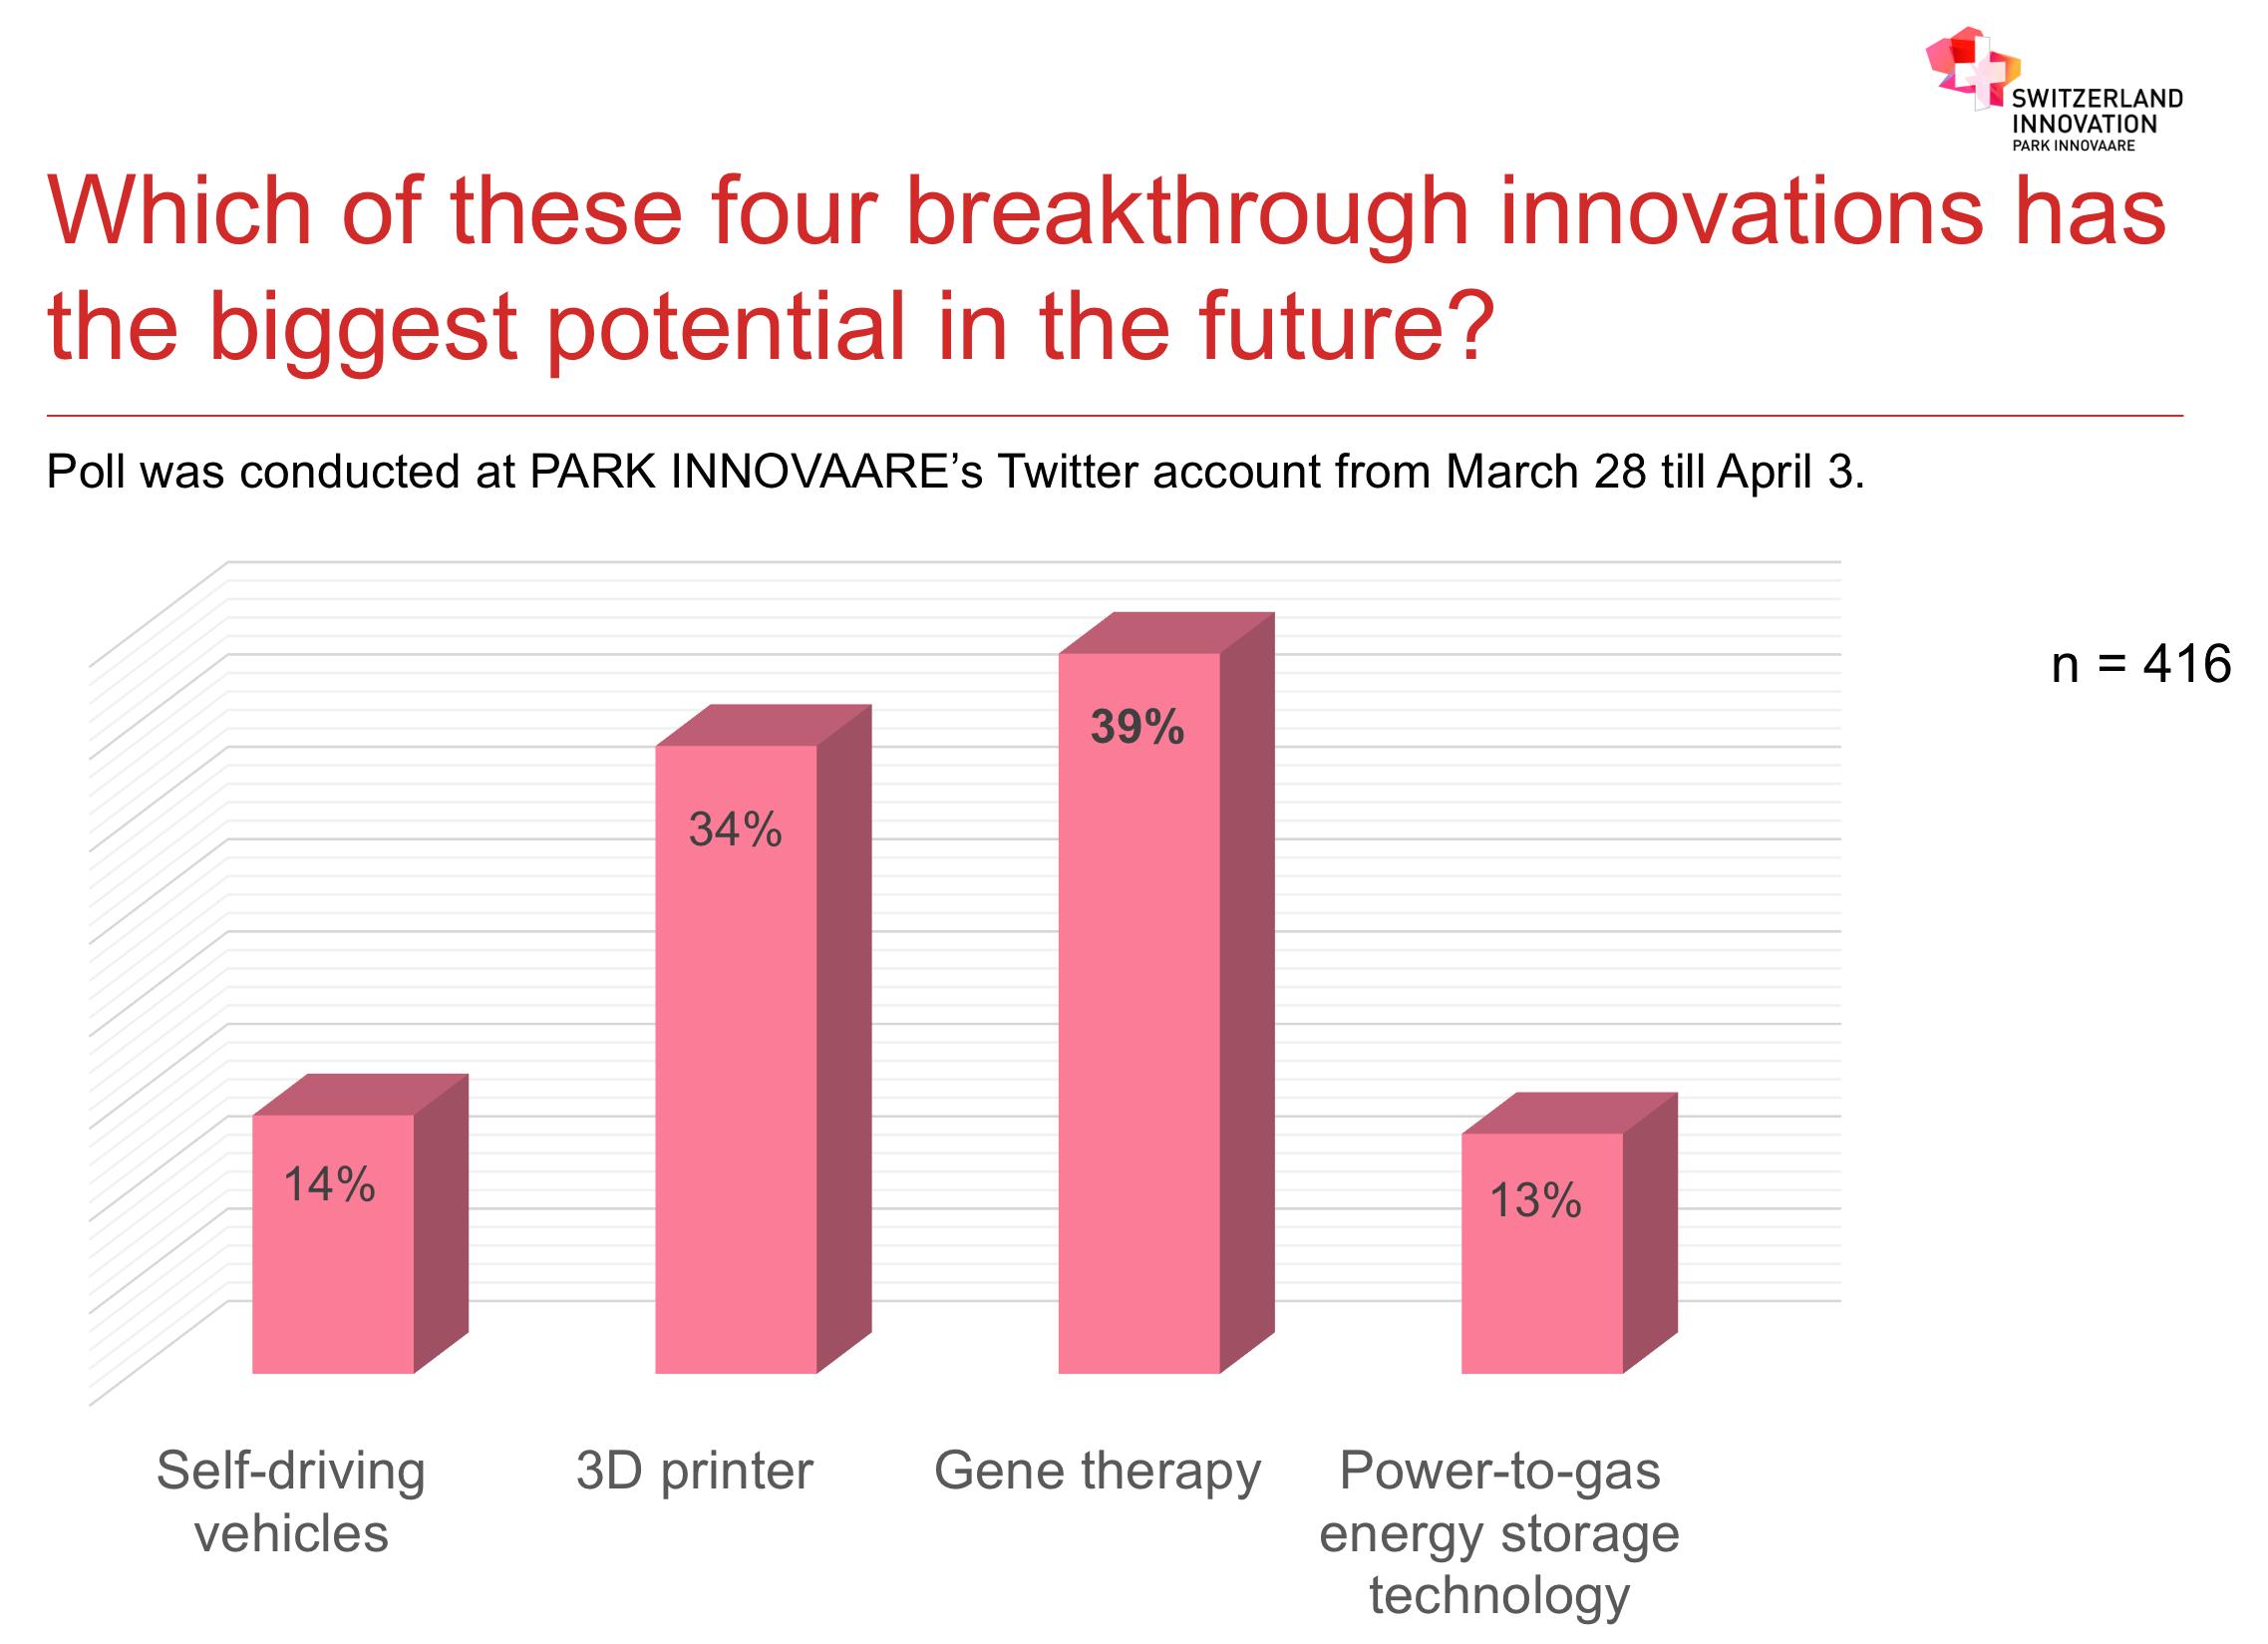 Breakthrough innovation poll